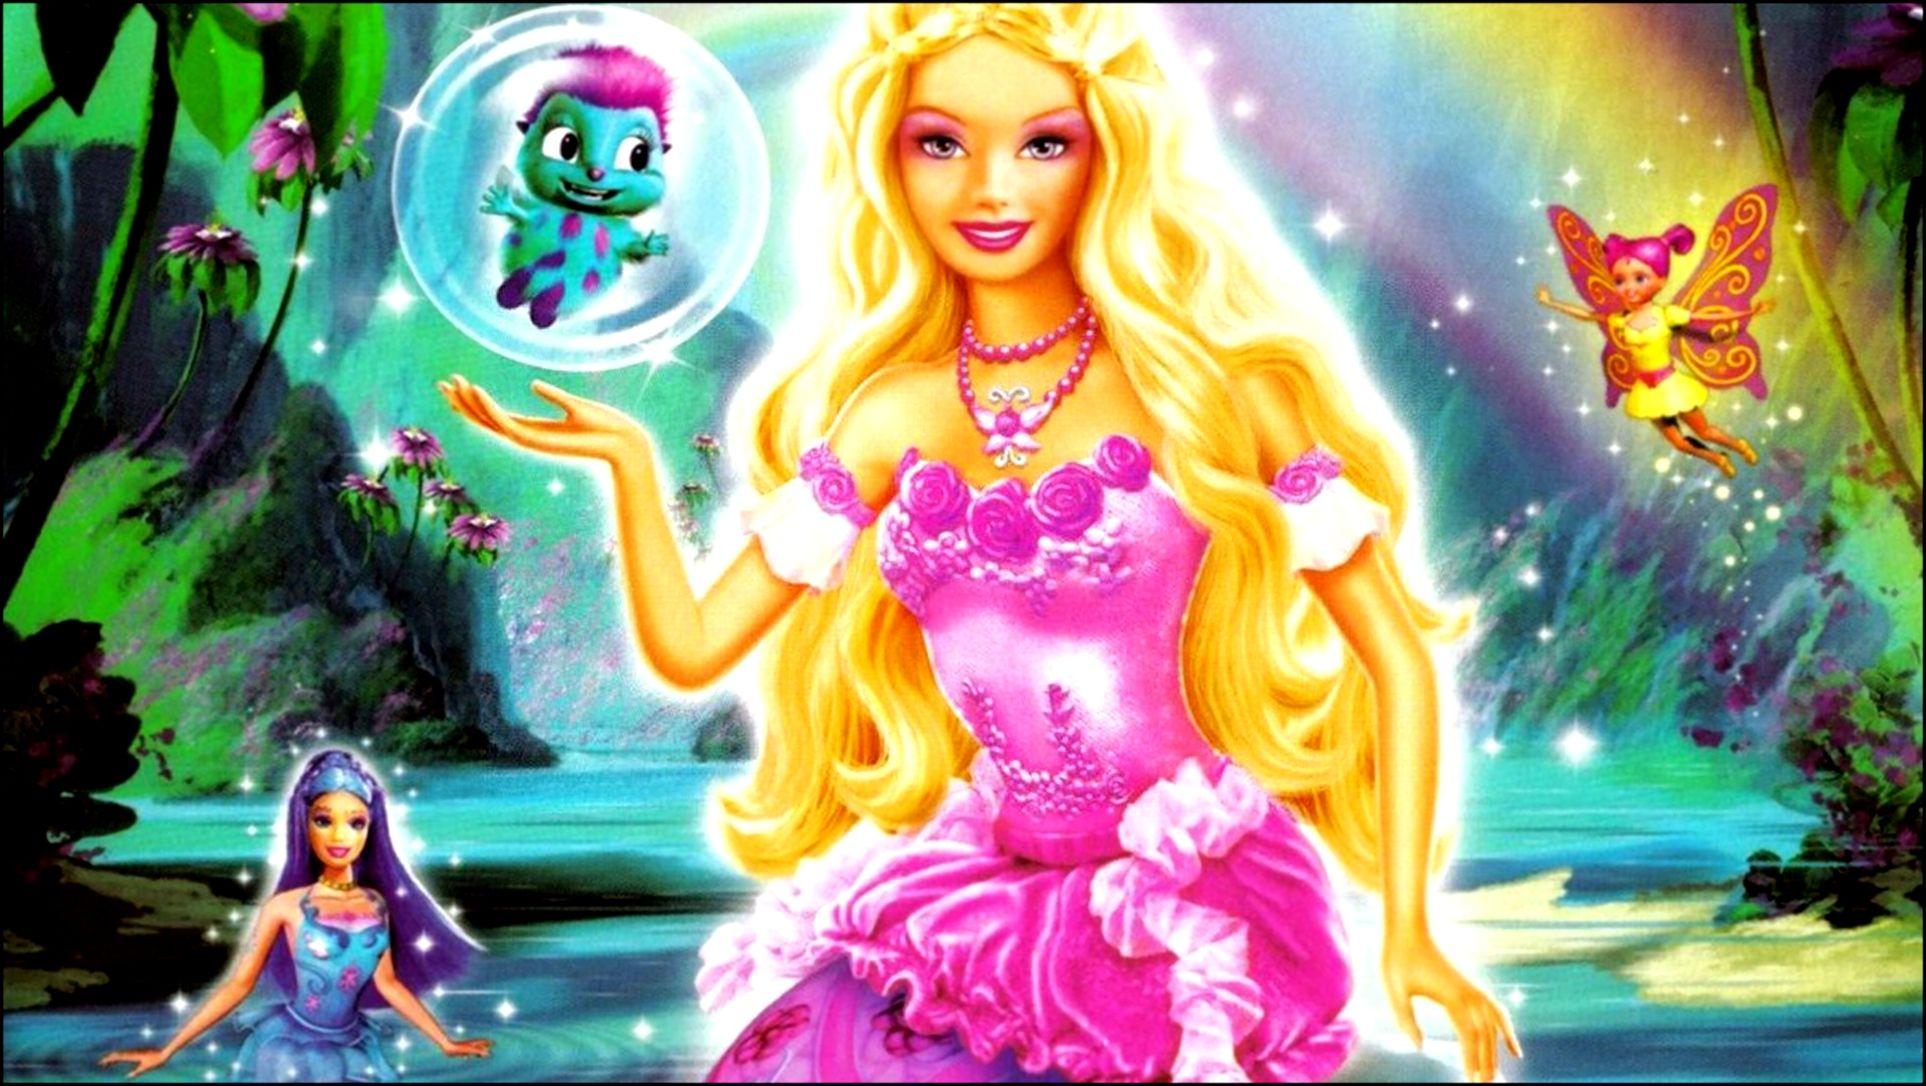 Barbie Hd Wallpapers Free Download 1945437 Hd Wallpaper